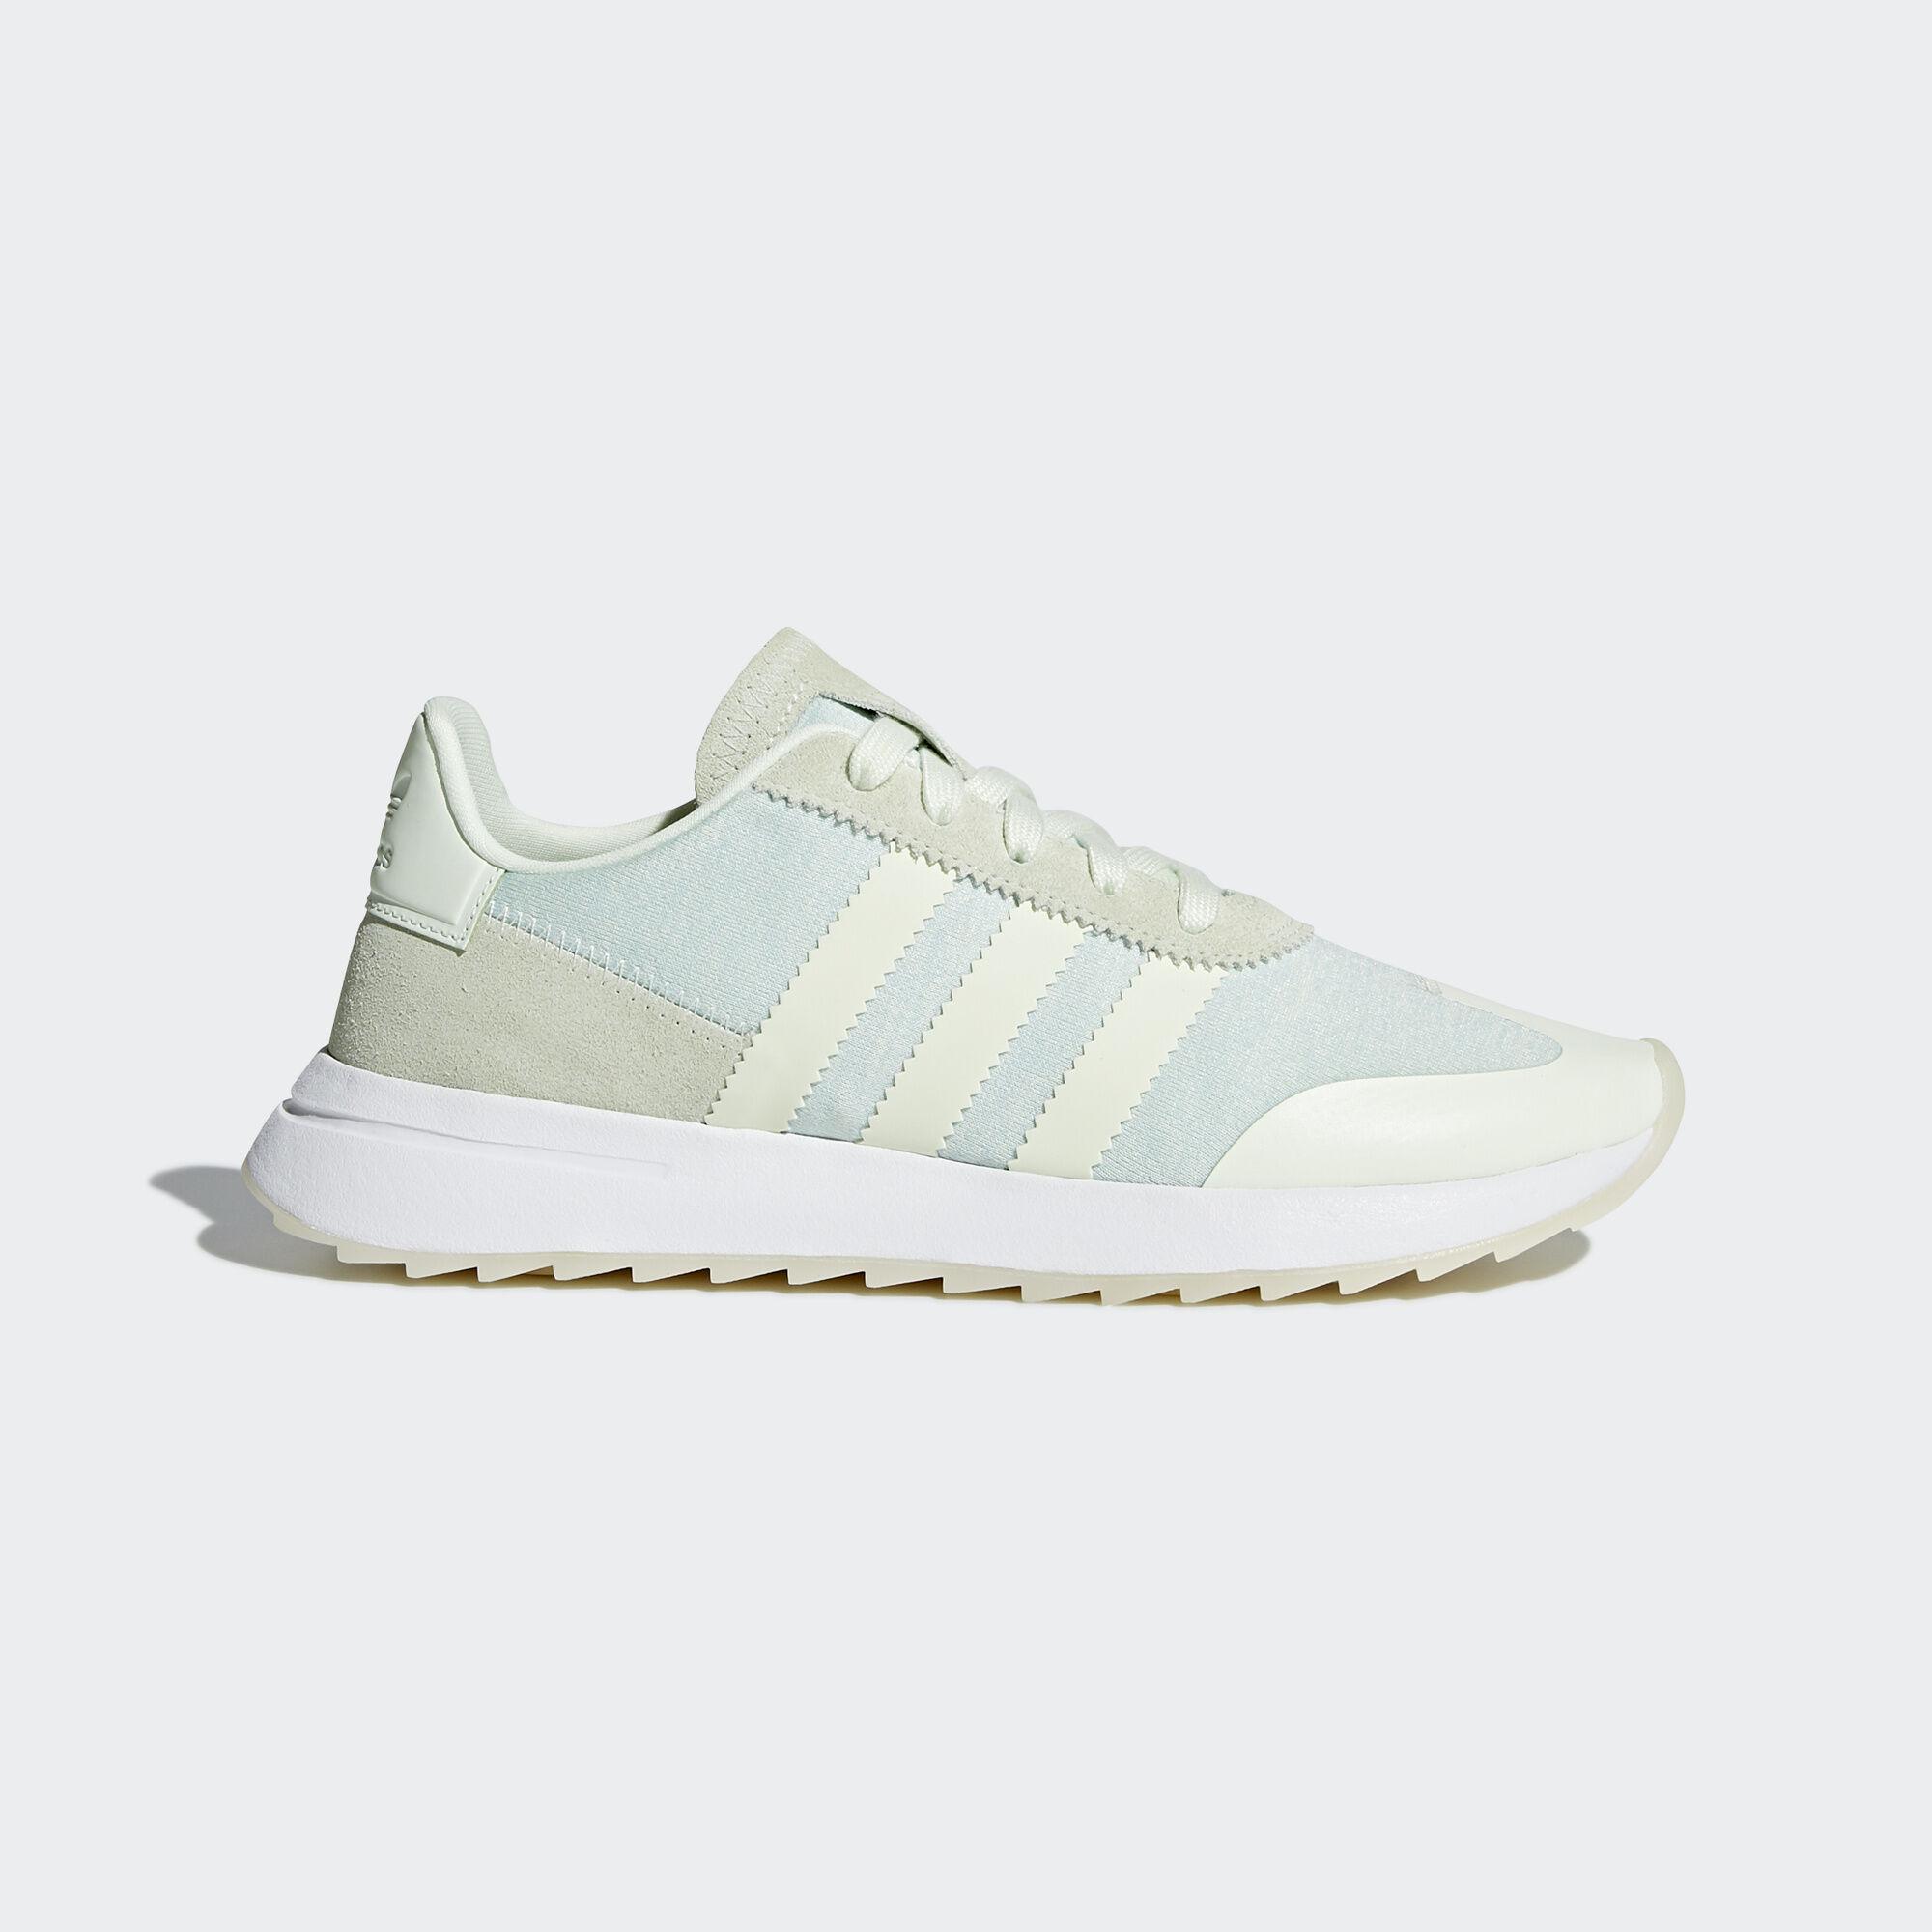 adidas - FLB_Runner Shoes Aero Green/Ftwr White/Ash Green CQ1971. Women  Originals